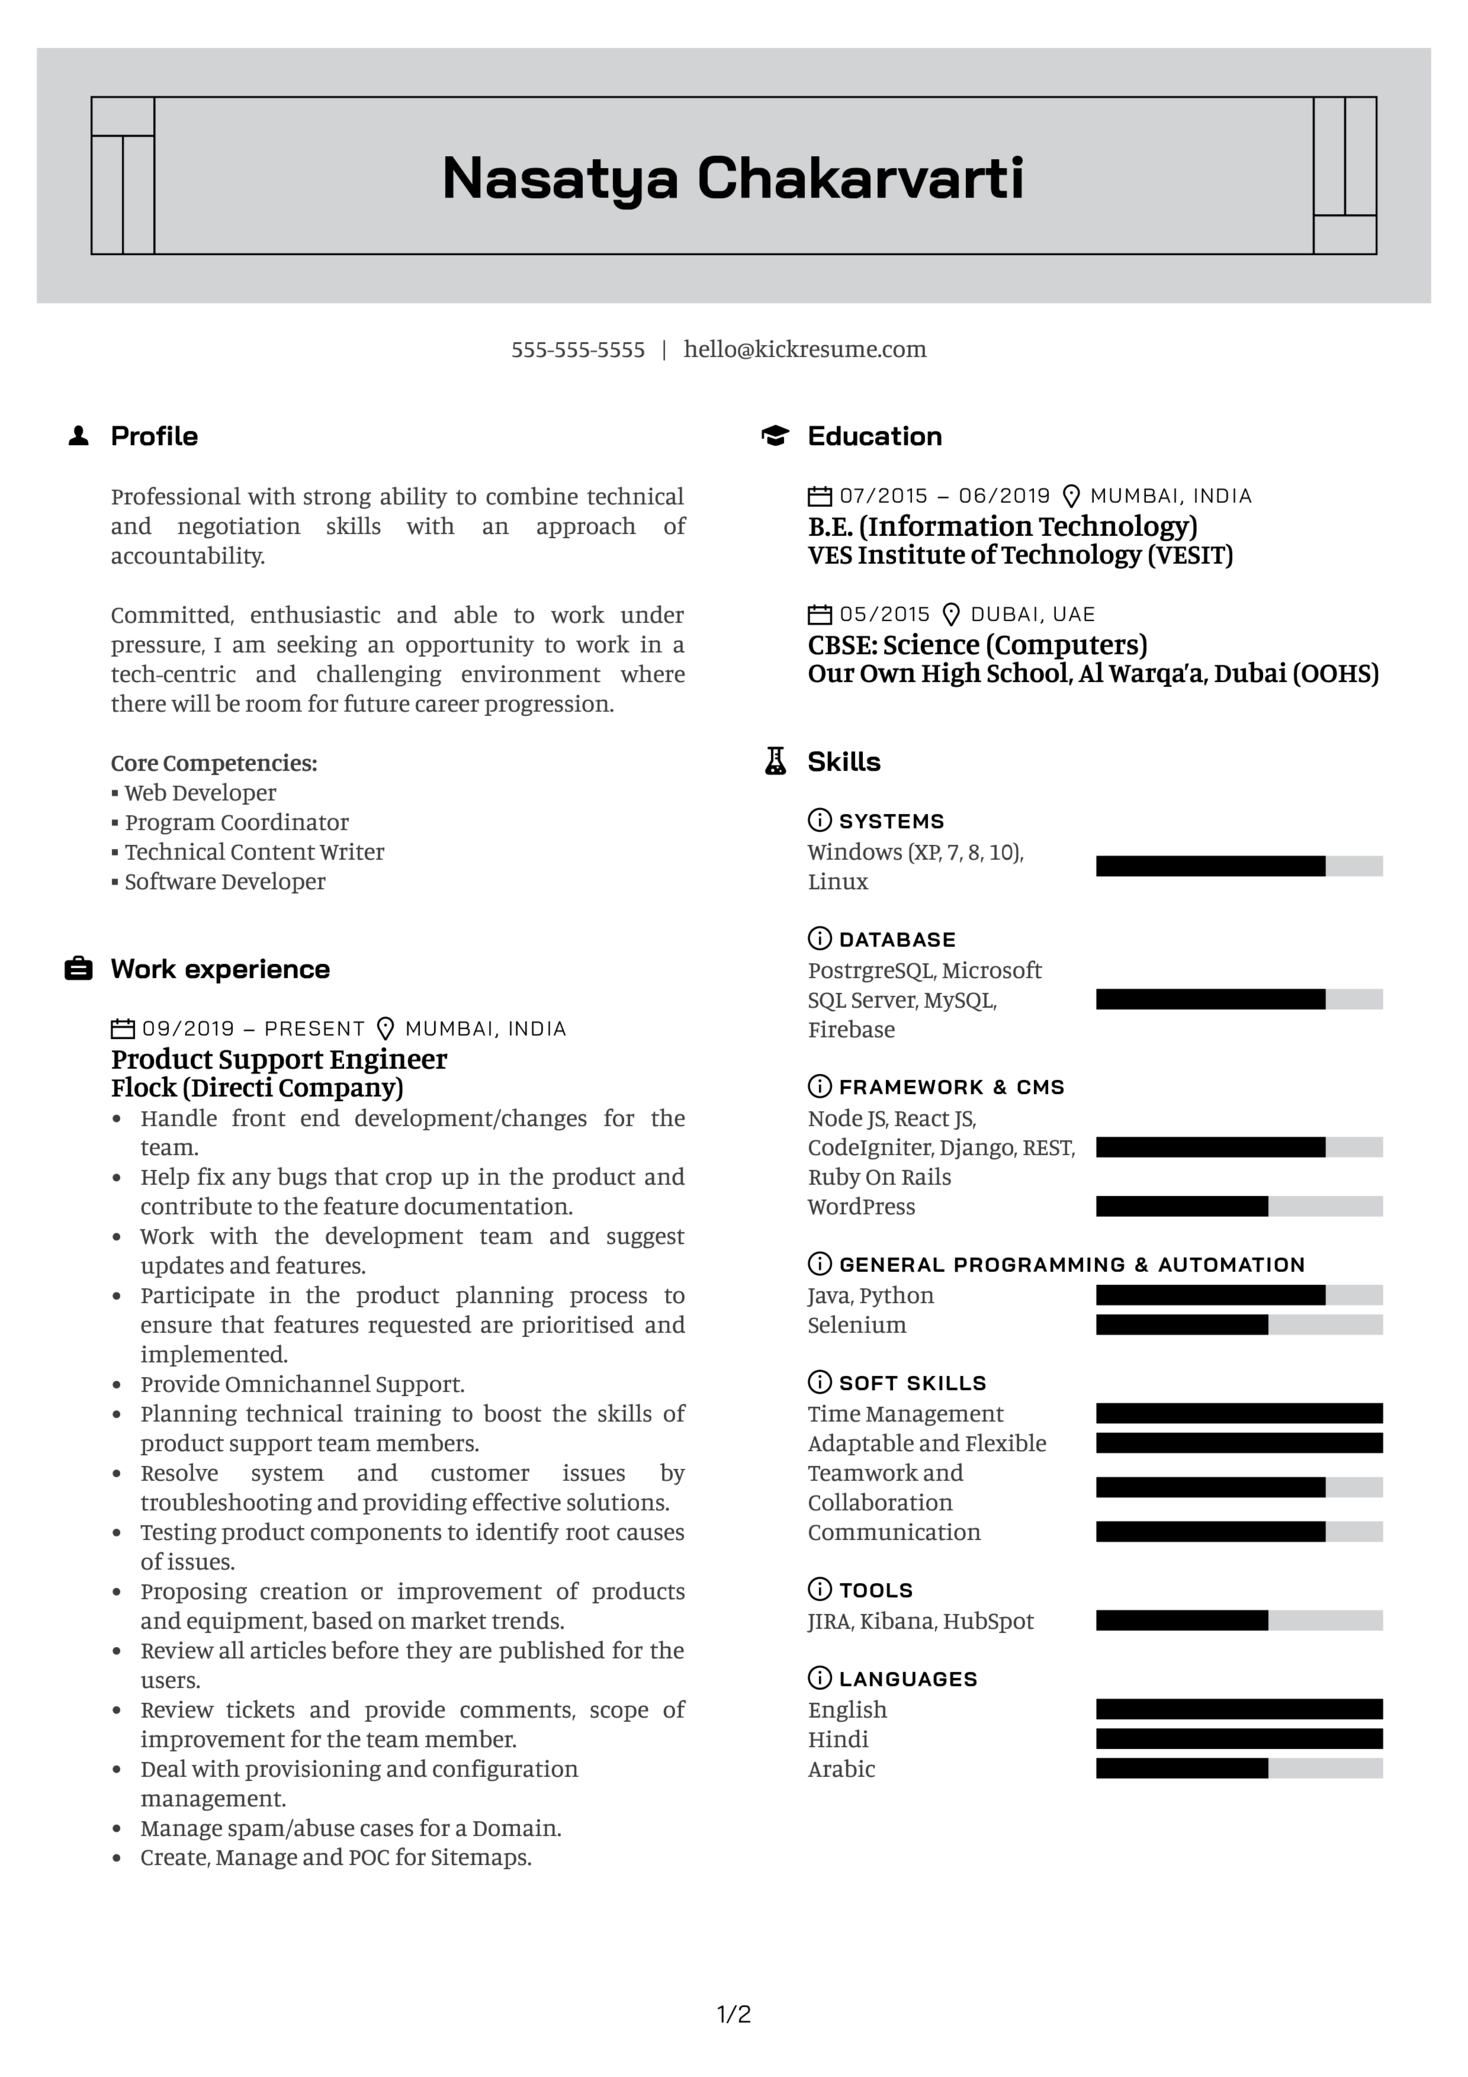 Product Engineer at Flock Resume Sample